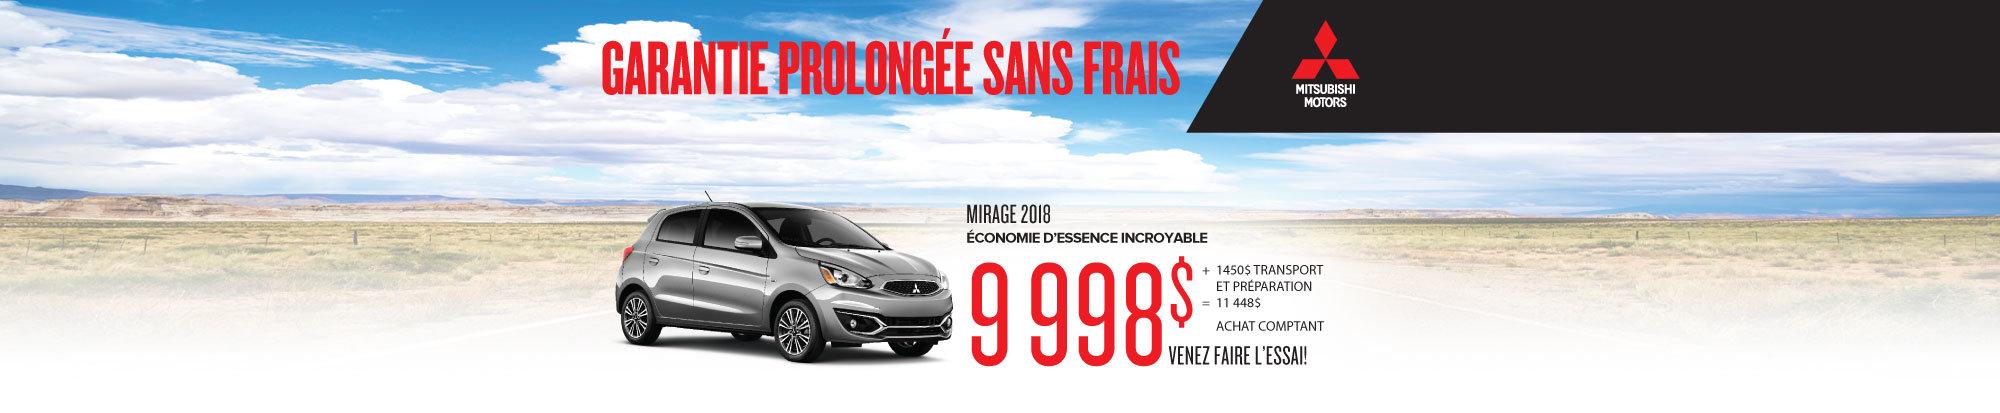 Mirage 2018 web